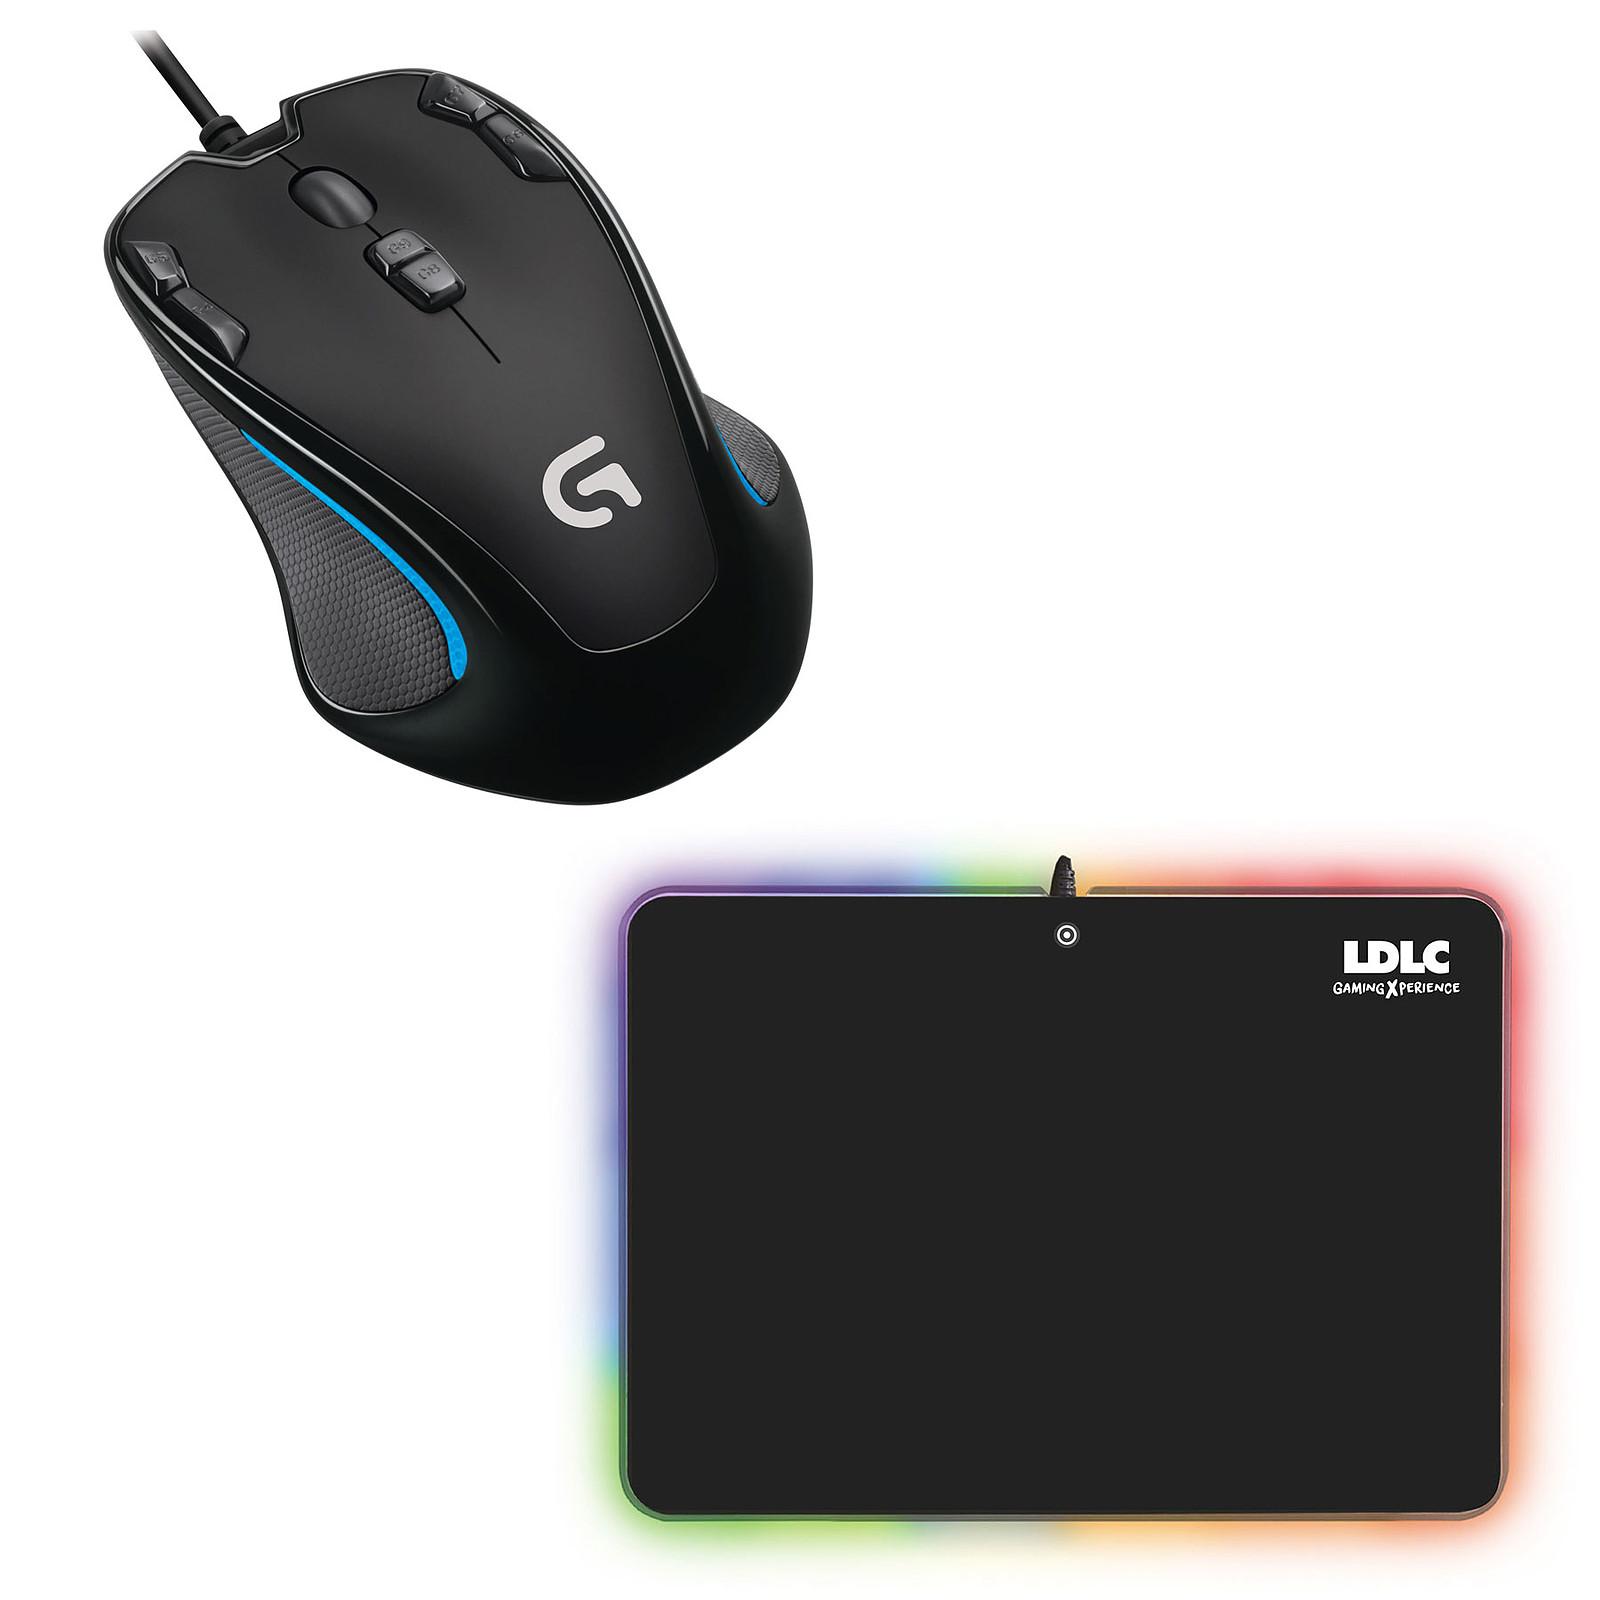 Logitech Gaming Mouse G300s + LDLC RGB PAD